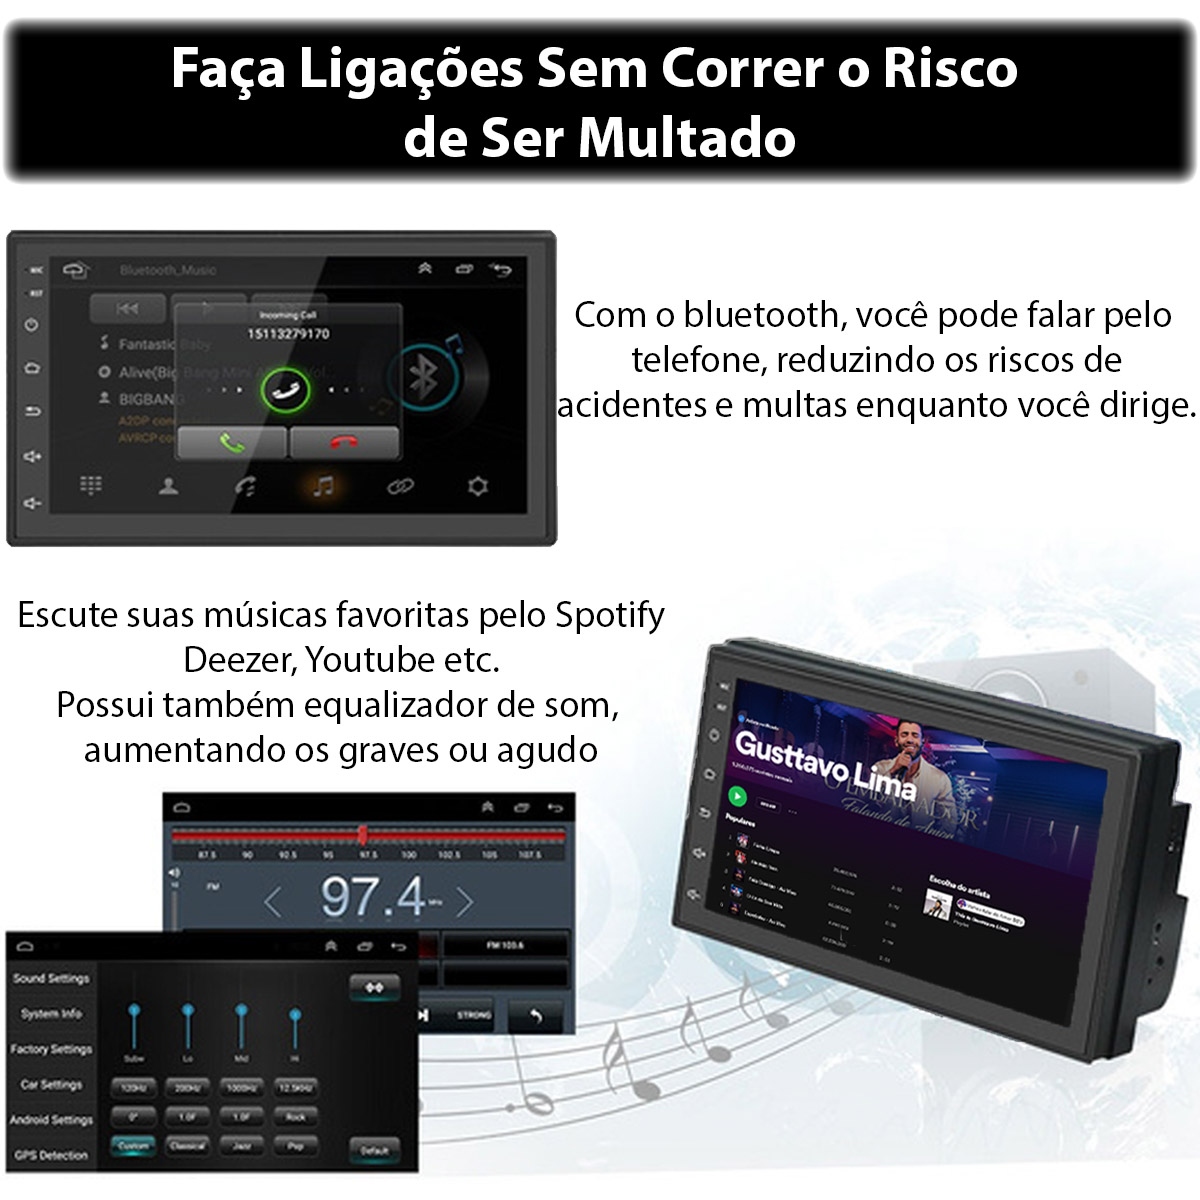 Central Multimidia com Moldura Volkswagen Gol G4 Mp5 Bluetooth Usb Touchscreen 7 Polegadas 2 Din Poliparts